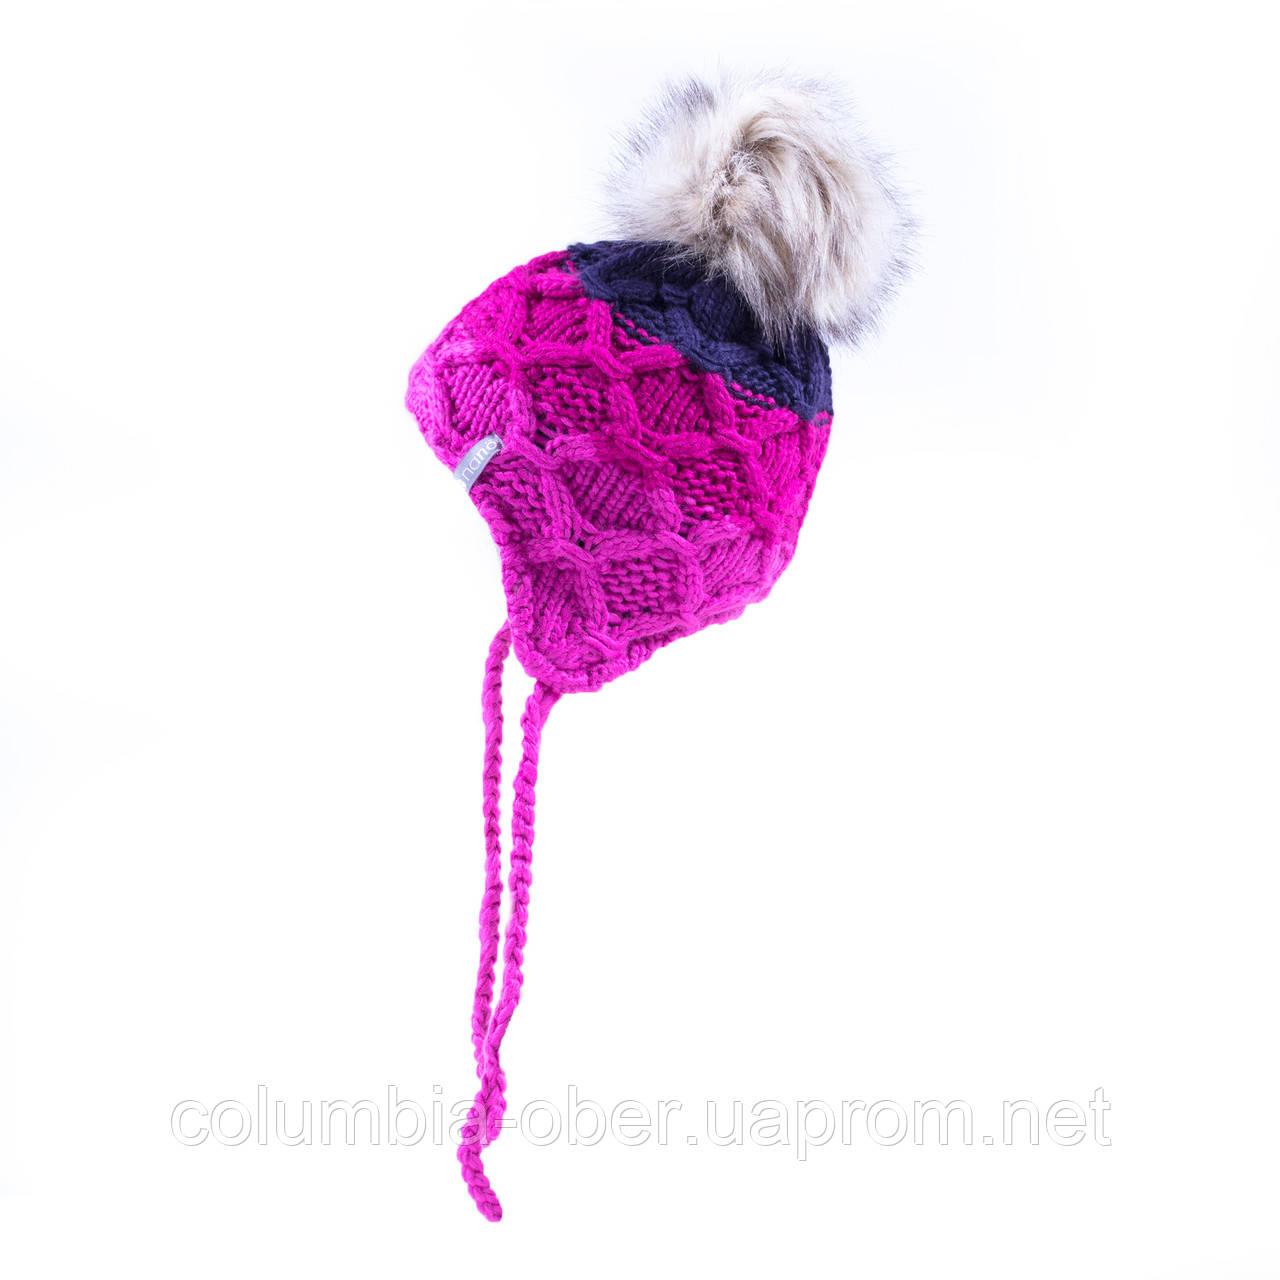 Зимняя шапка для девочки Nano F19TU276 Purple. Размеры 2/4 и 5/6Х.